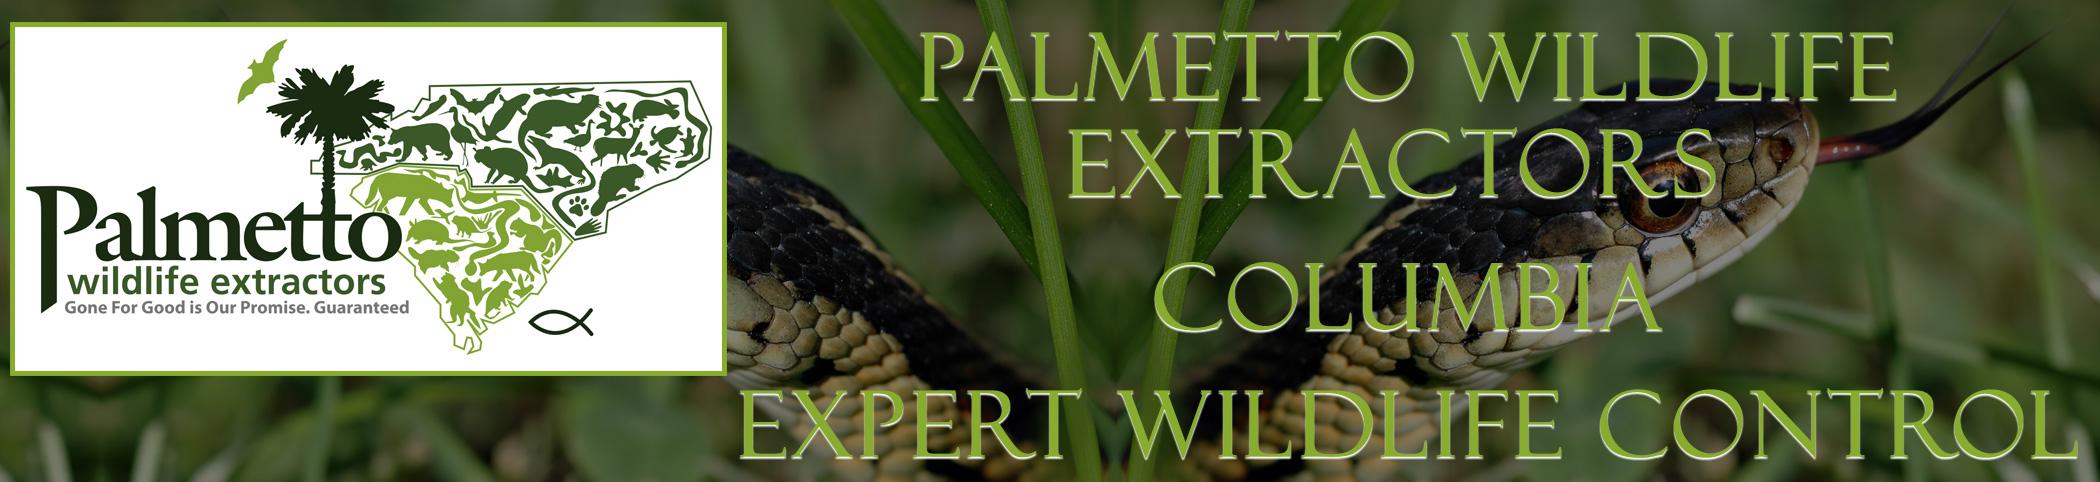 Palmetto Wildlife Extractors columbia south carolina header image